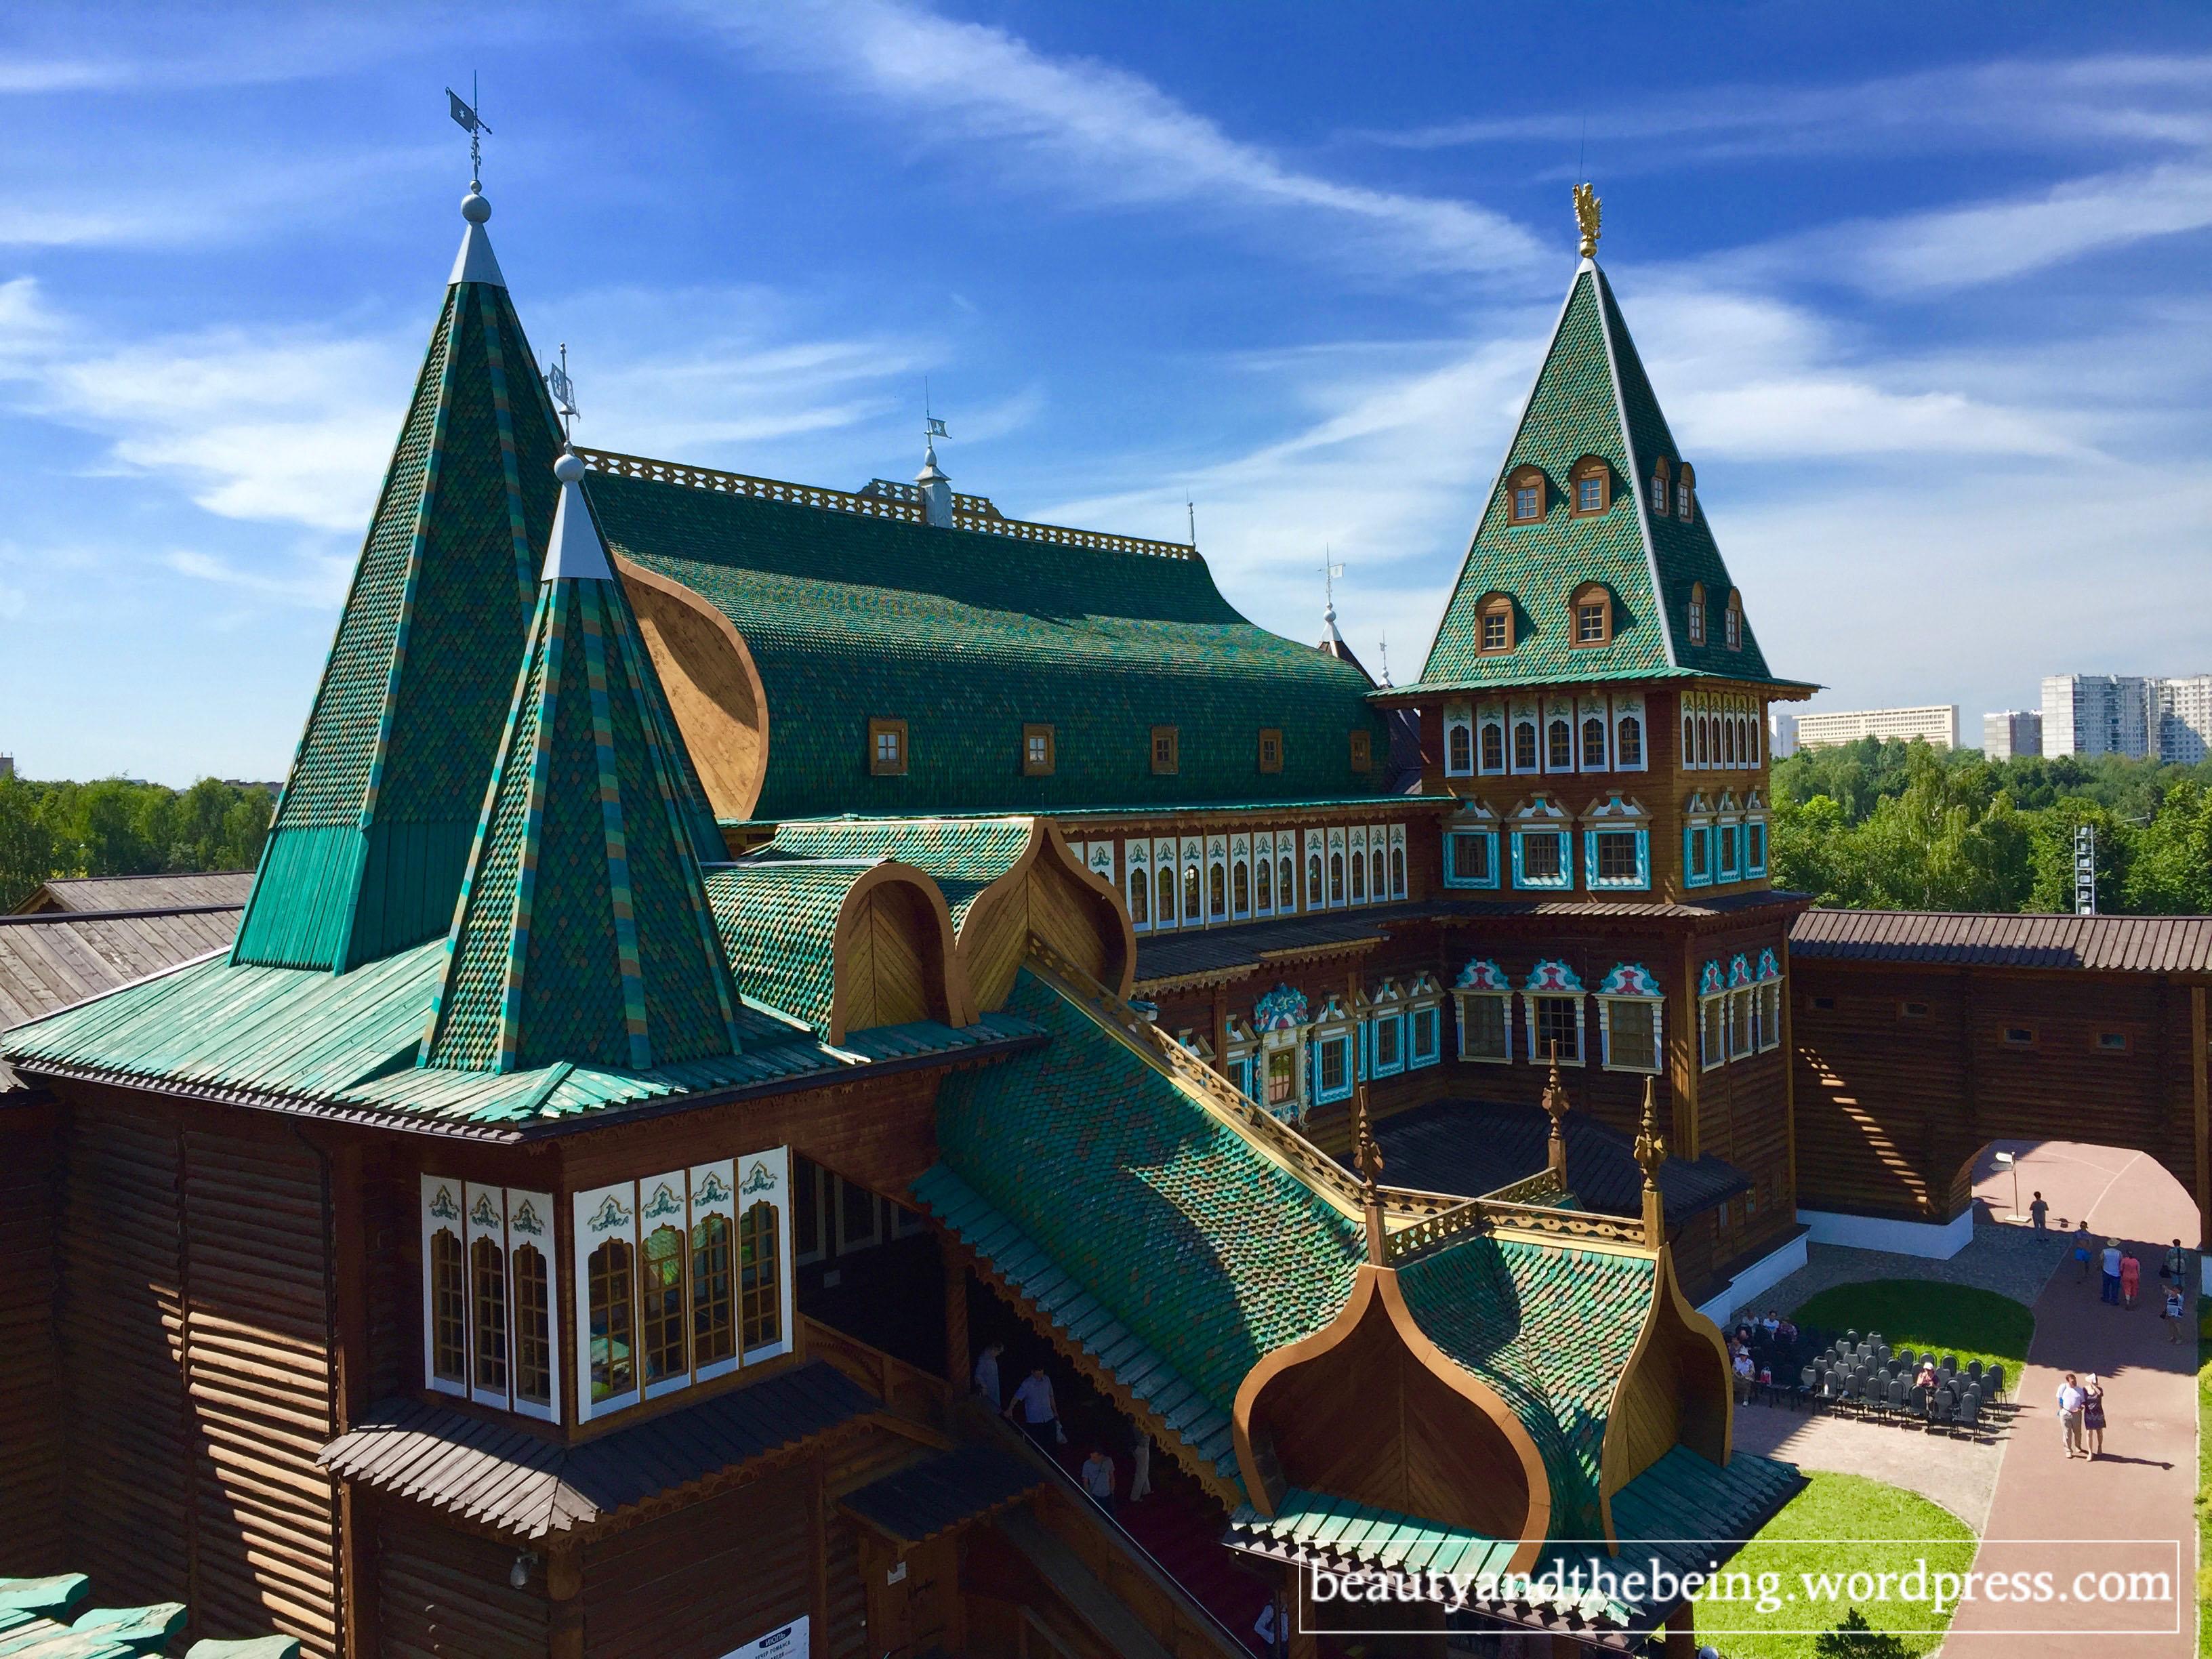 Great Wooden Palace, Kolomenskoye